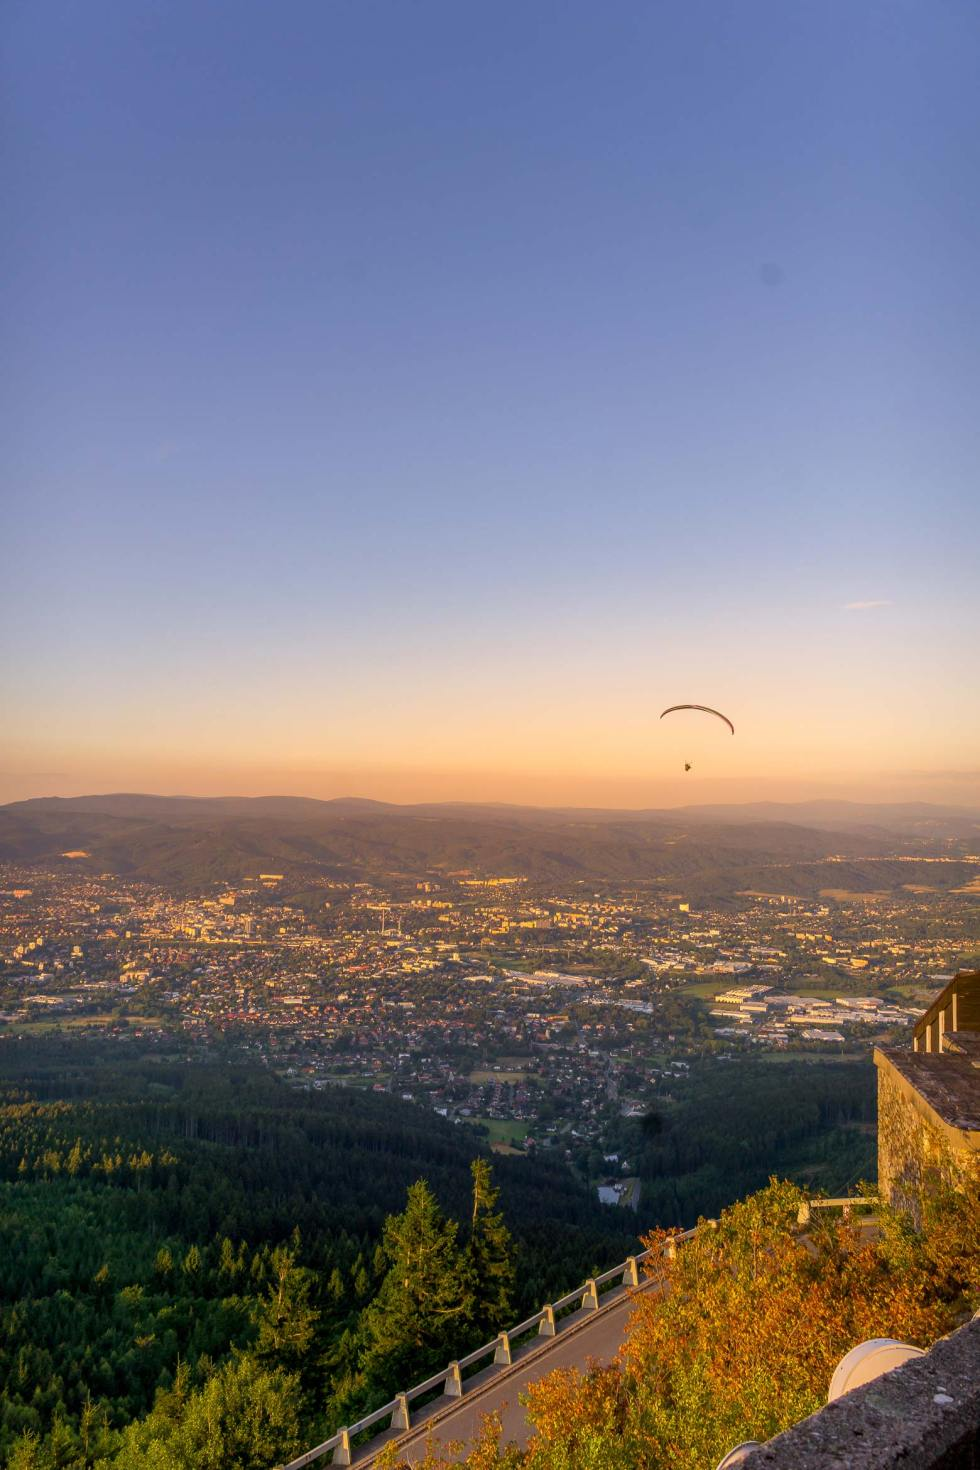 hang gliding in the Czech Republic